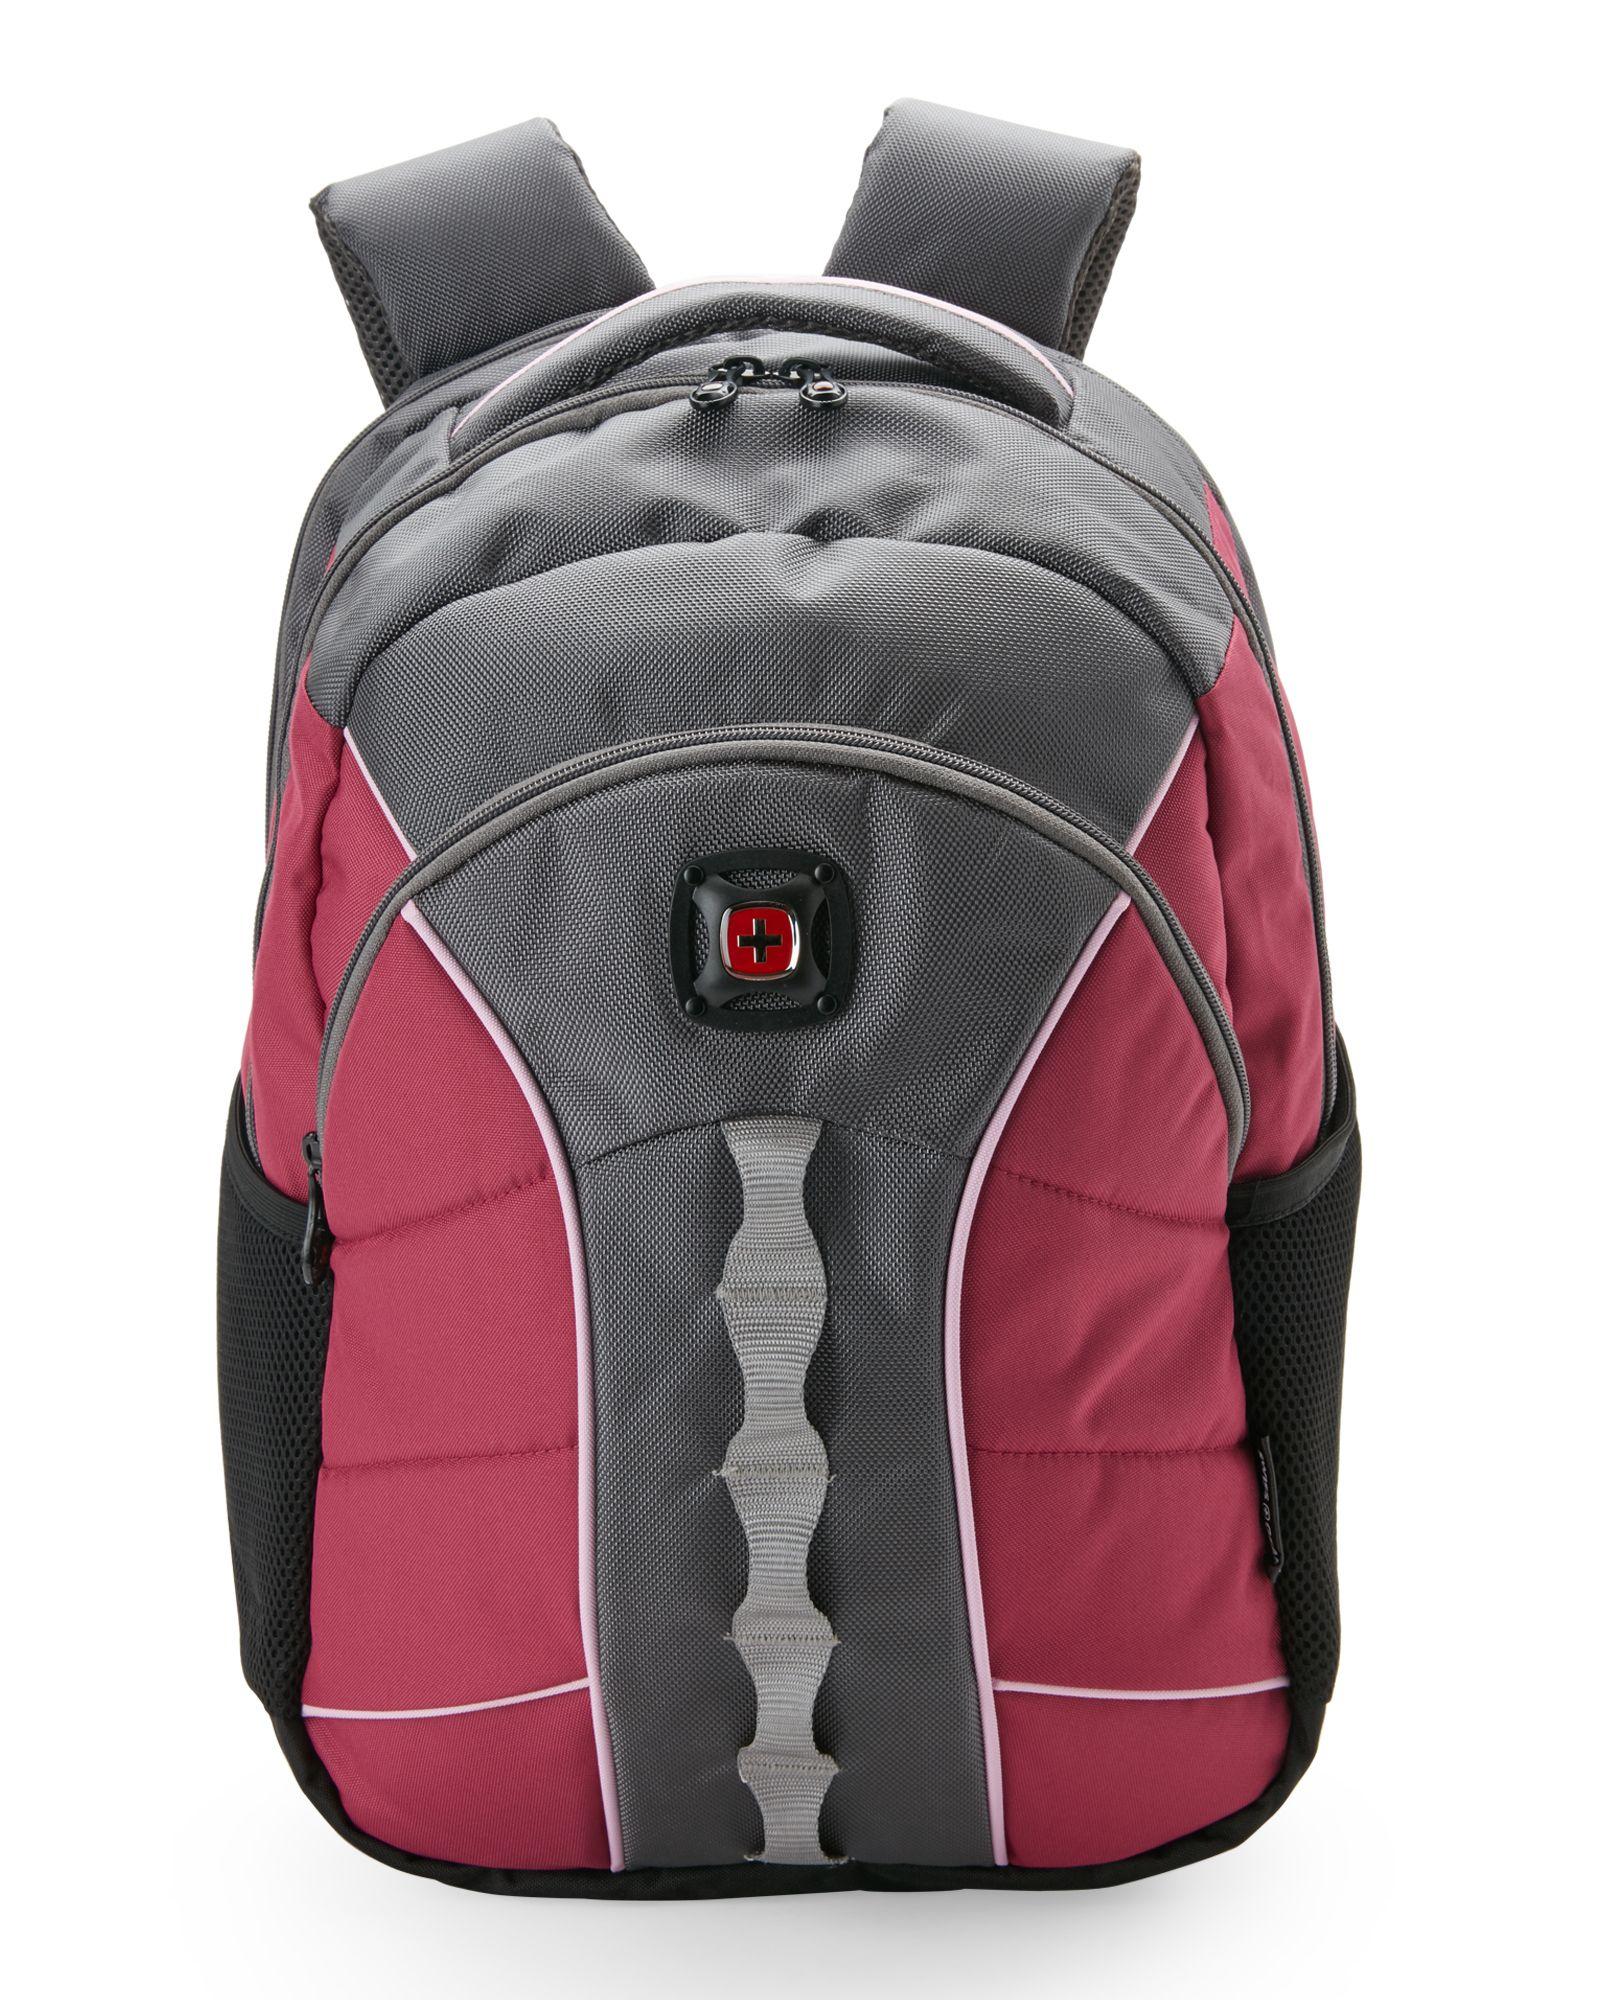 Swiss Gear Sun 16 Quot Laptop Backpack Backpacks Laptop